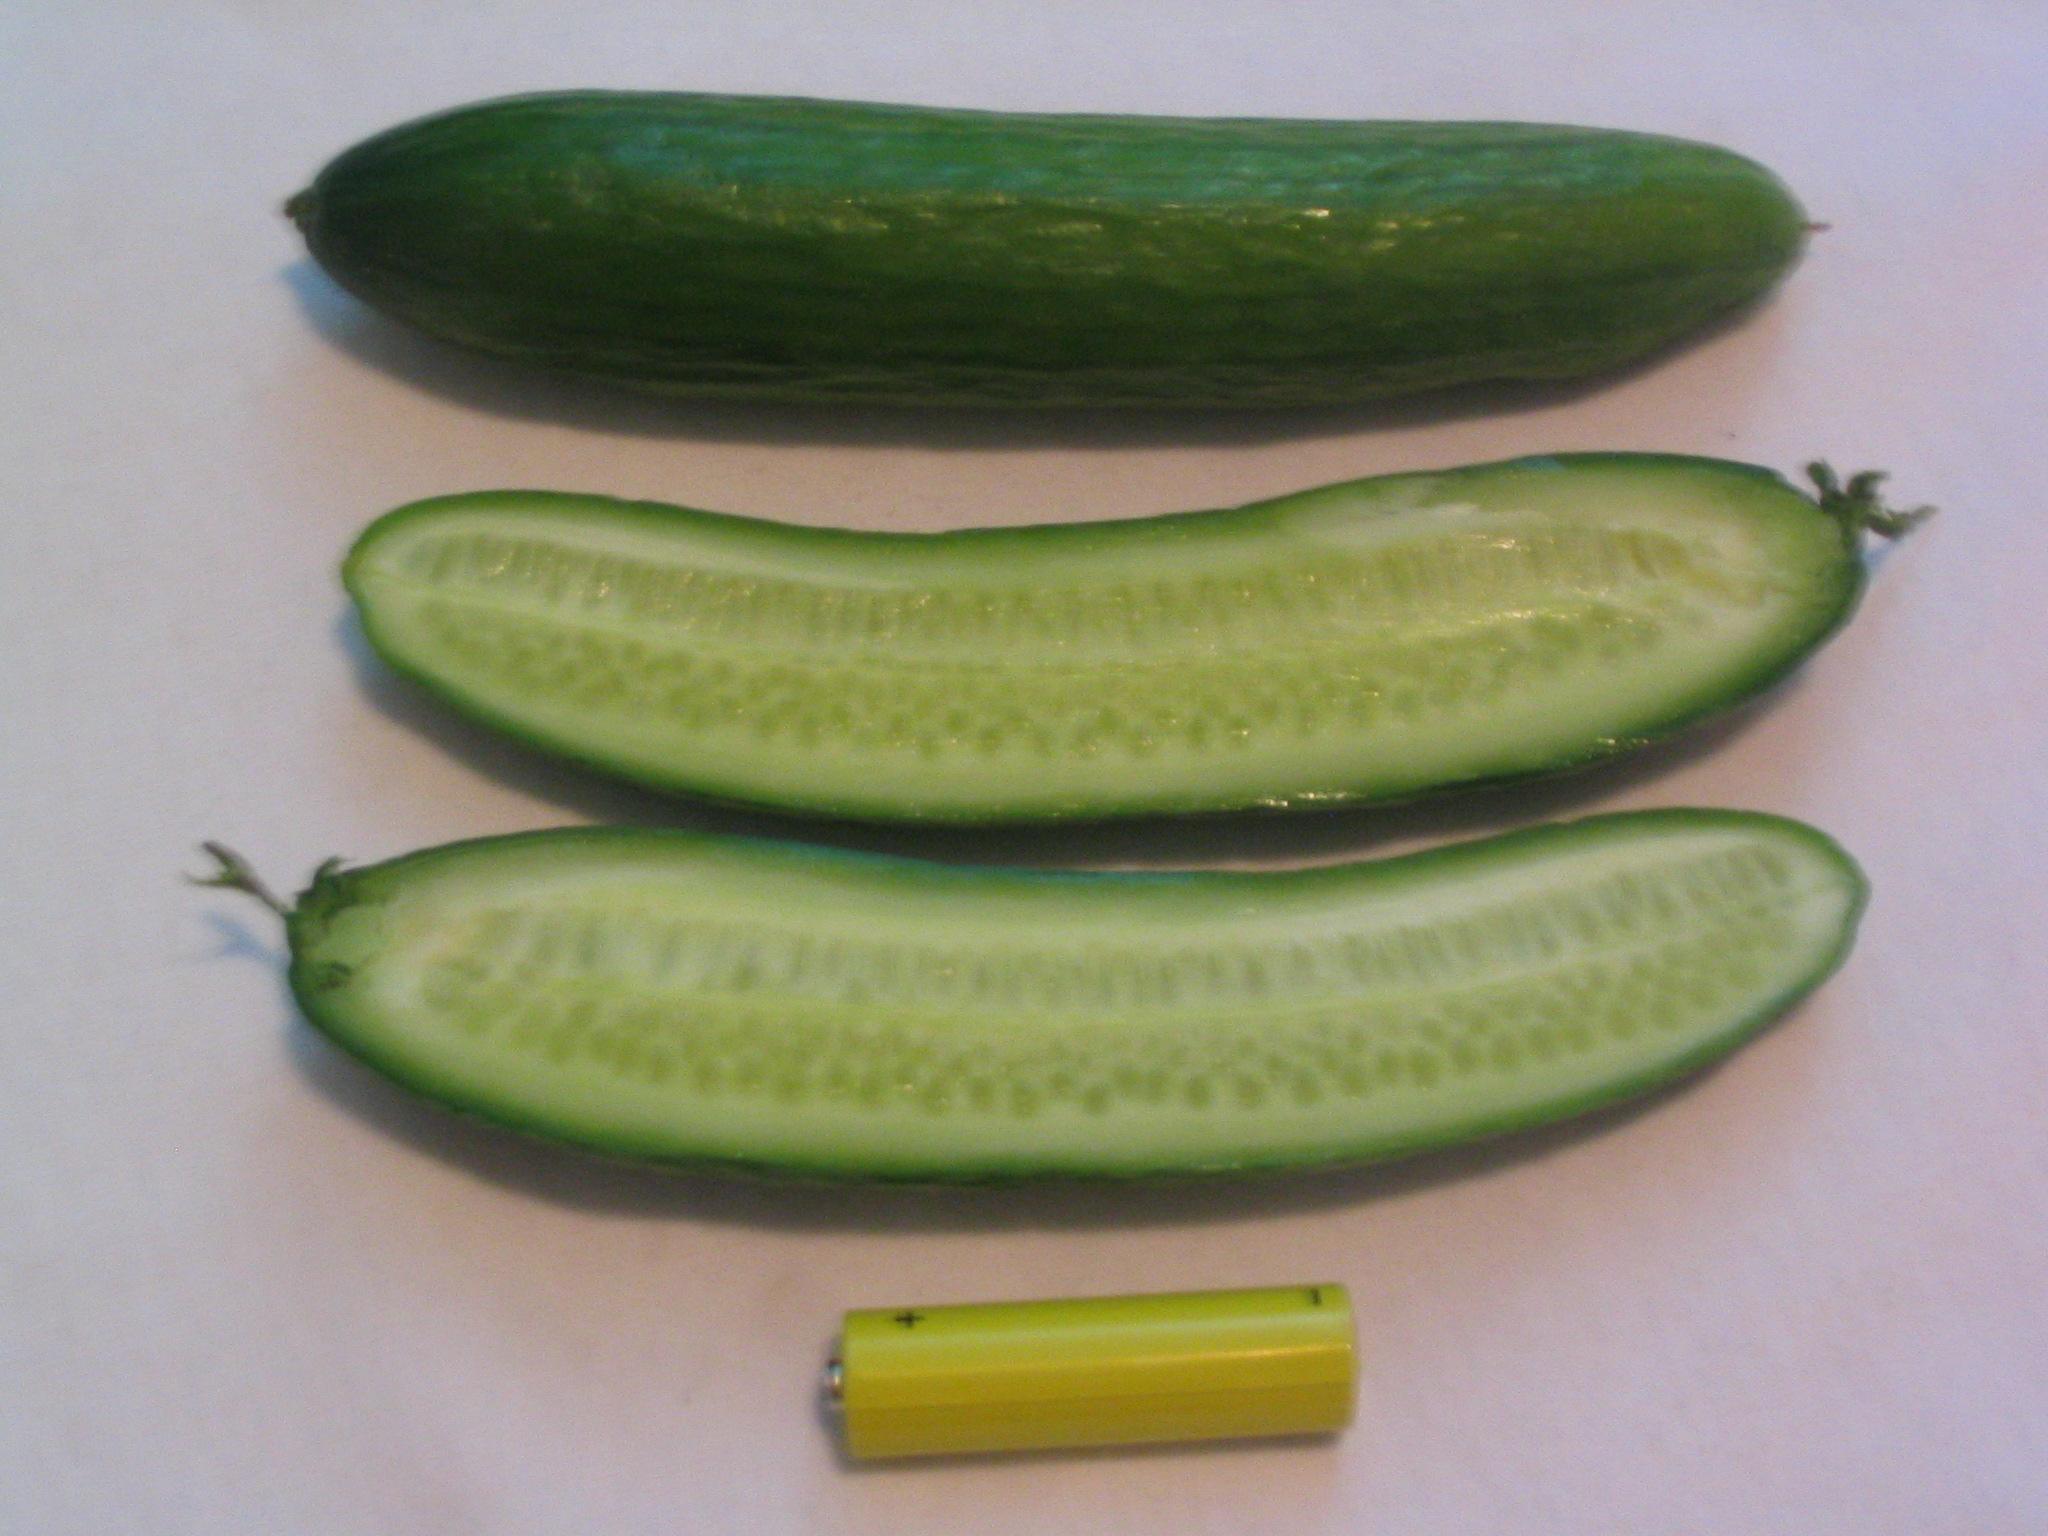 File:Mediterranean cucumber.JPG - Wikimedia Commons